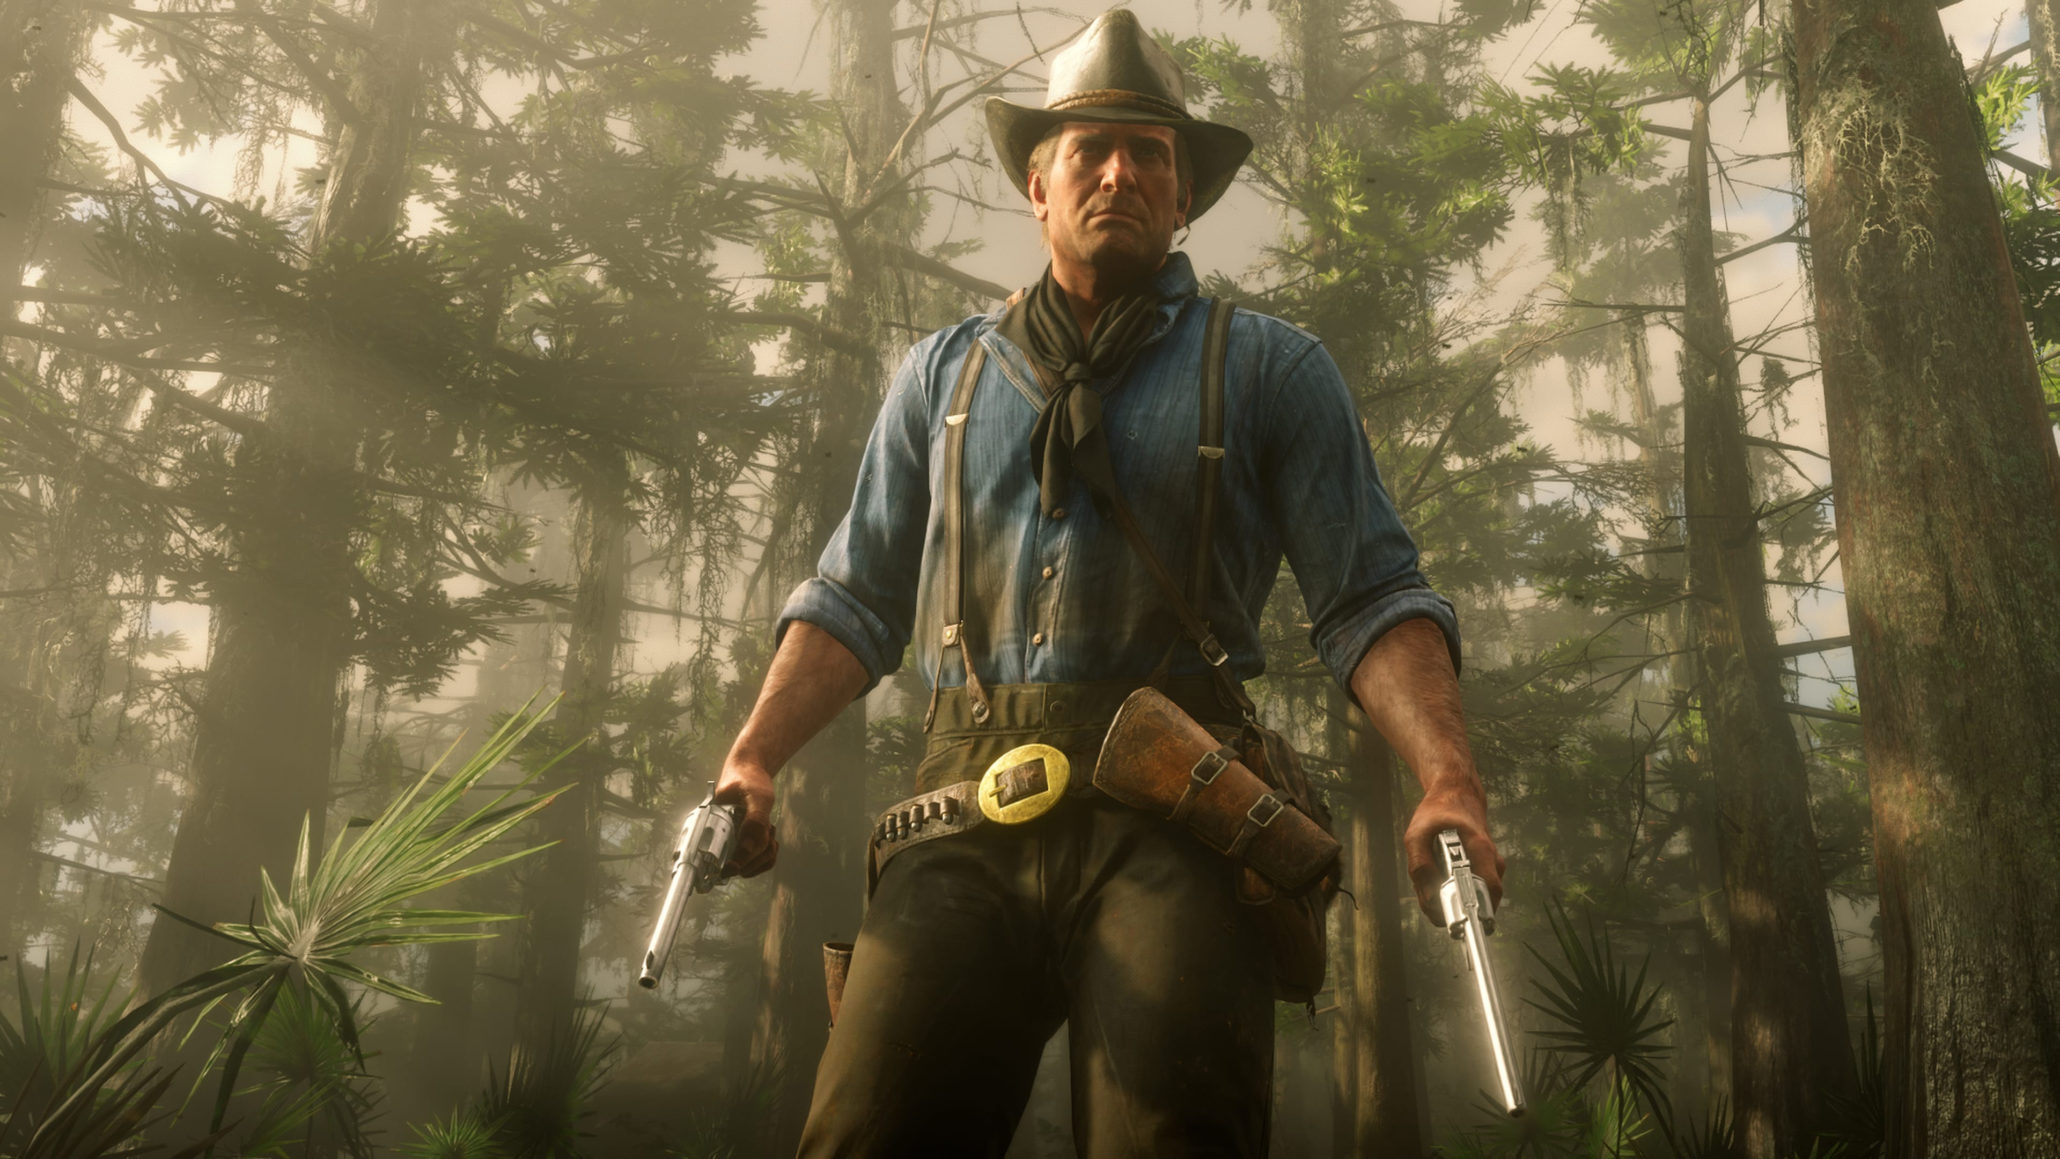 PC verze Red Dead Redemption 2 se připomíná launch trailerem